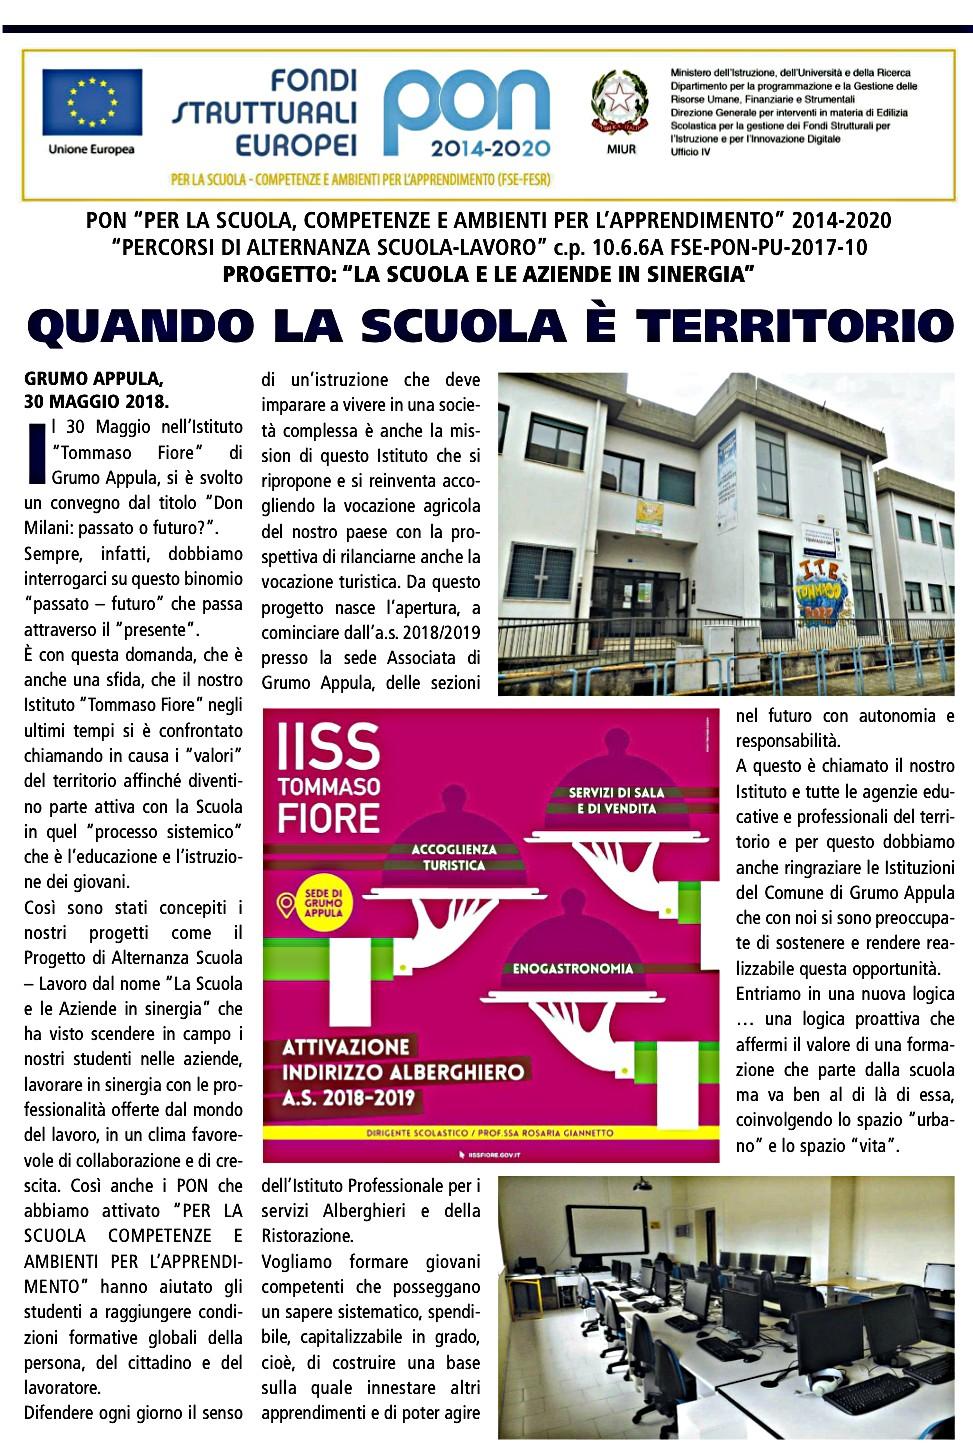 http://www.grumonline.it/images/2018/LaRepubblica_20180603.jpg